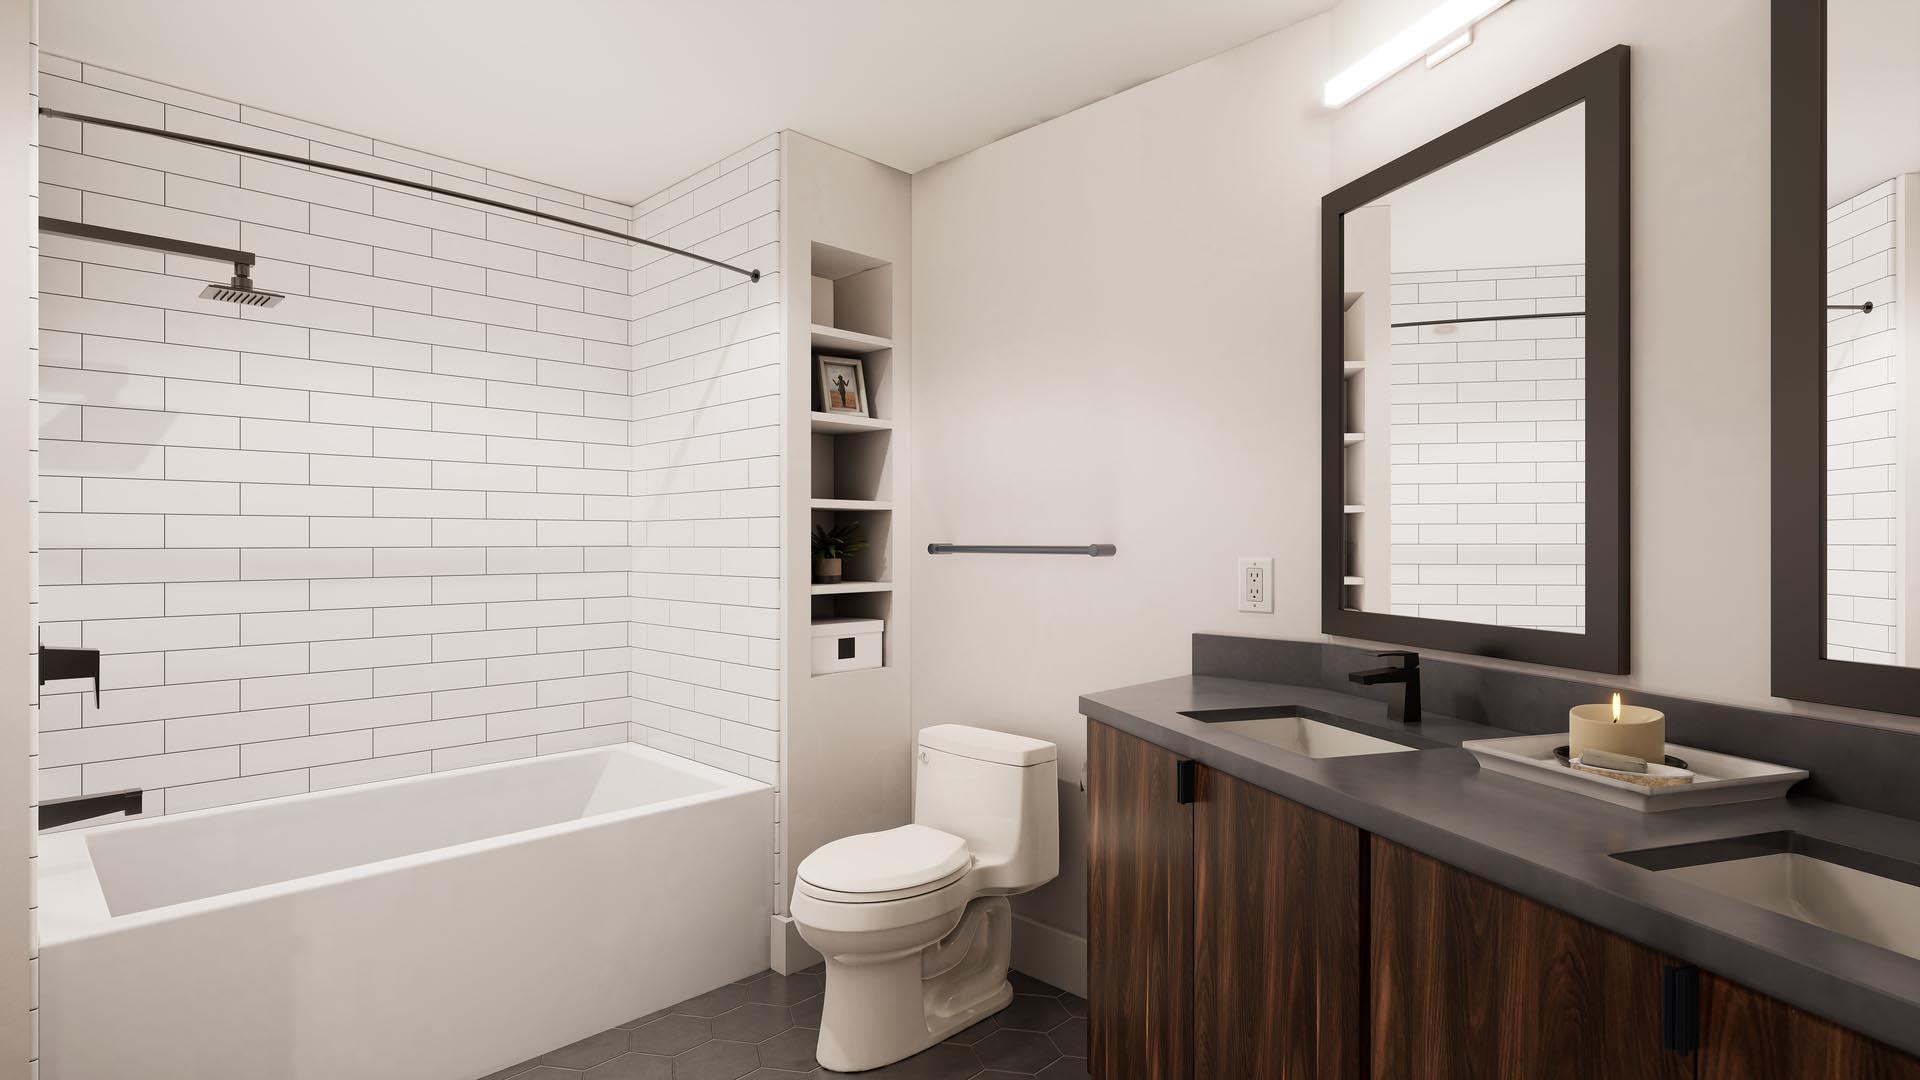 An apartment bathroom with finish option 1